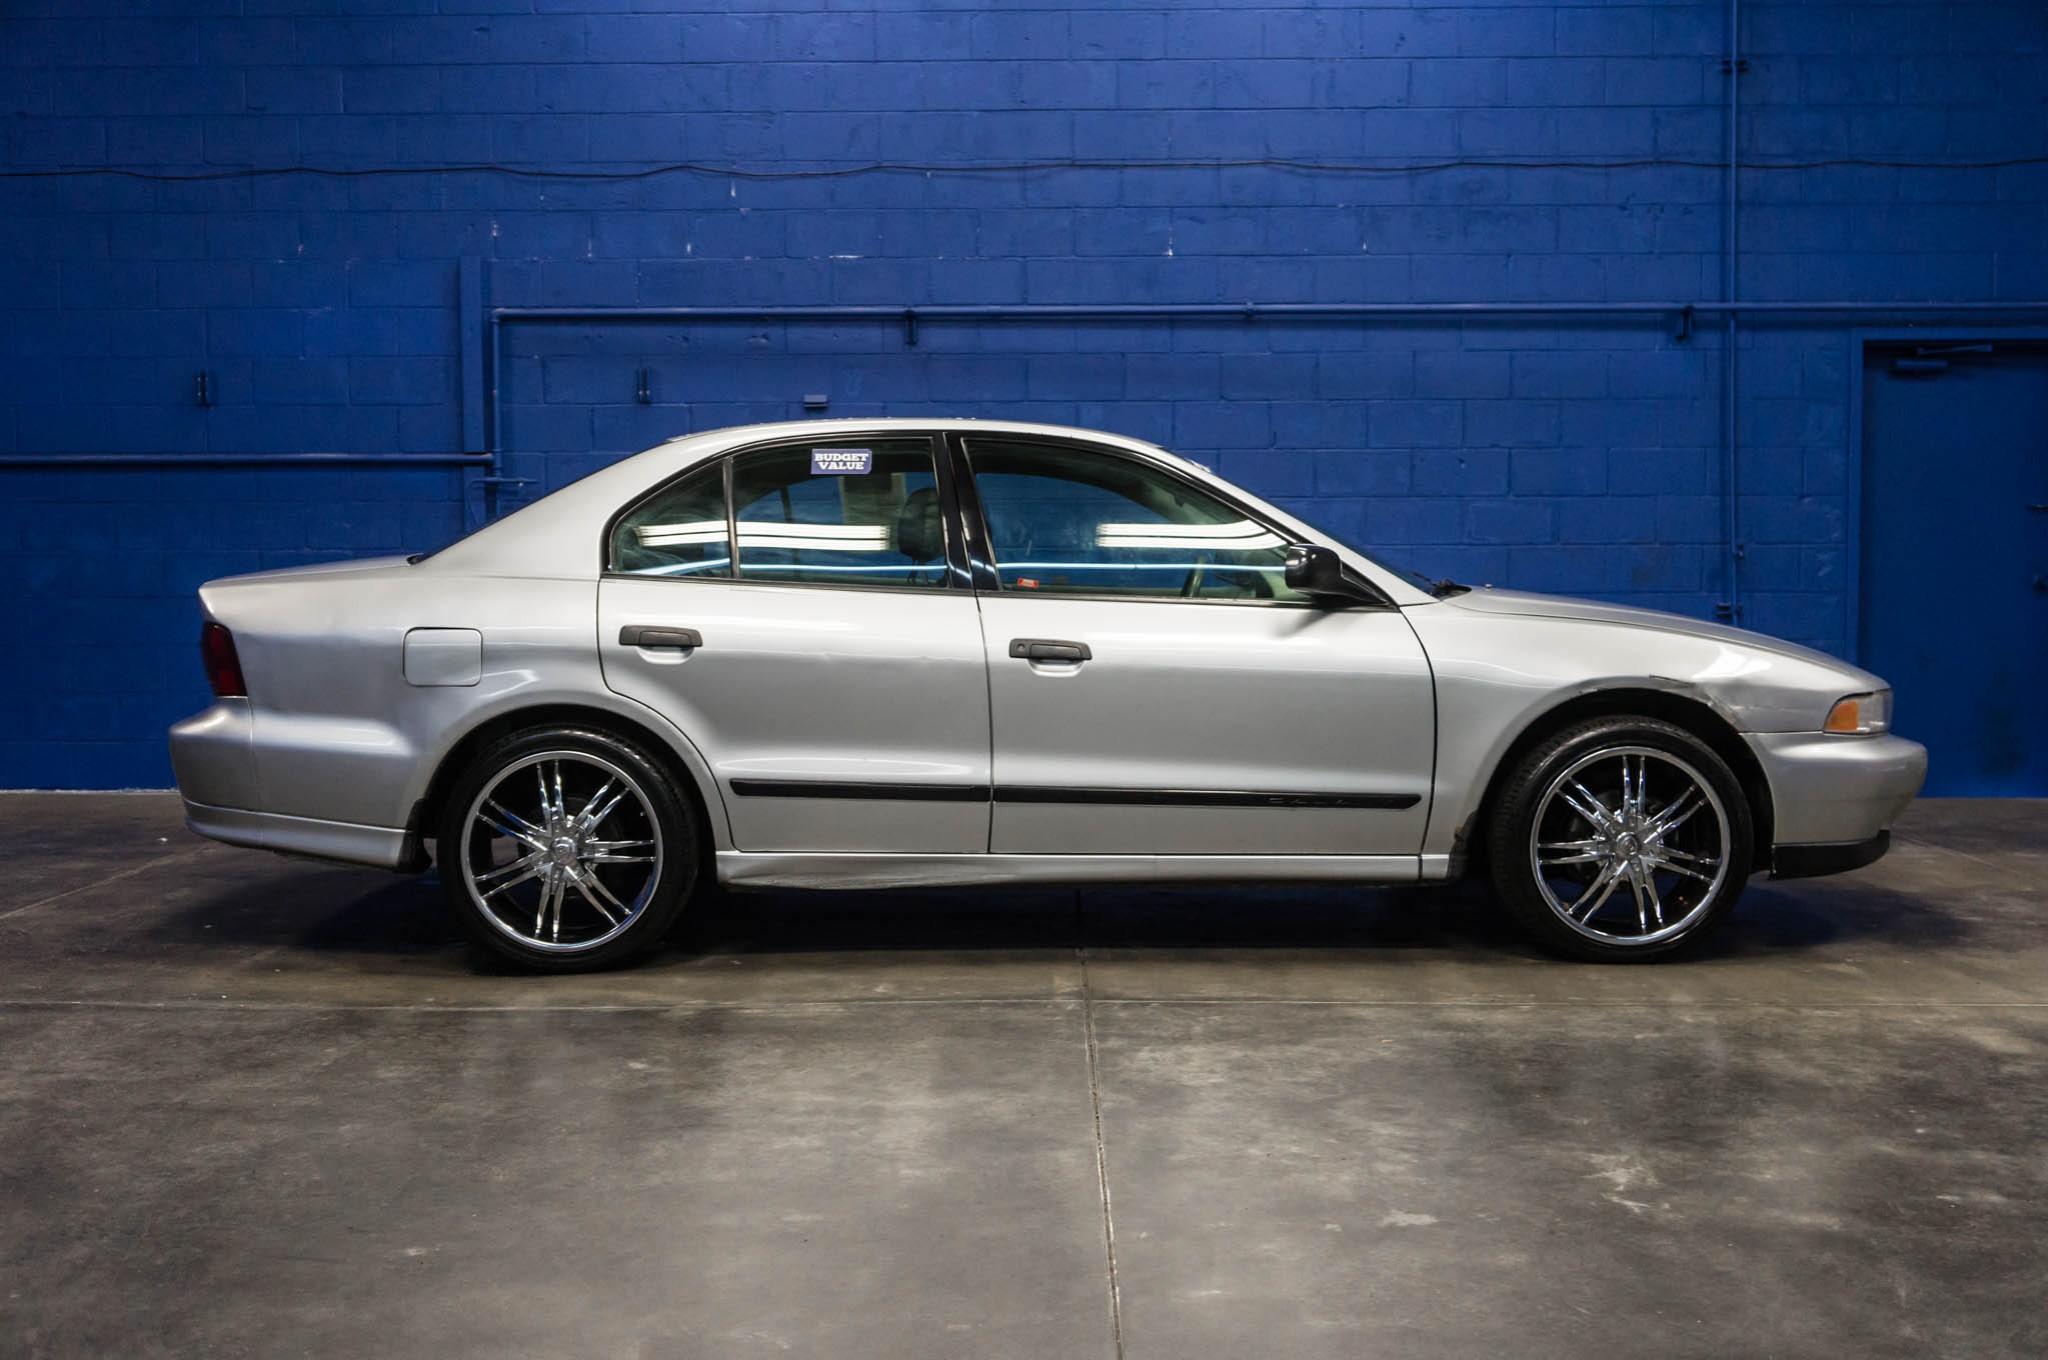 extra used ny sedan galant mitsubishi staten island for in cars sale